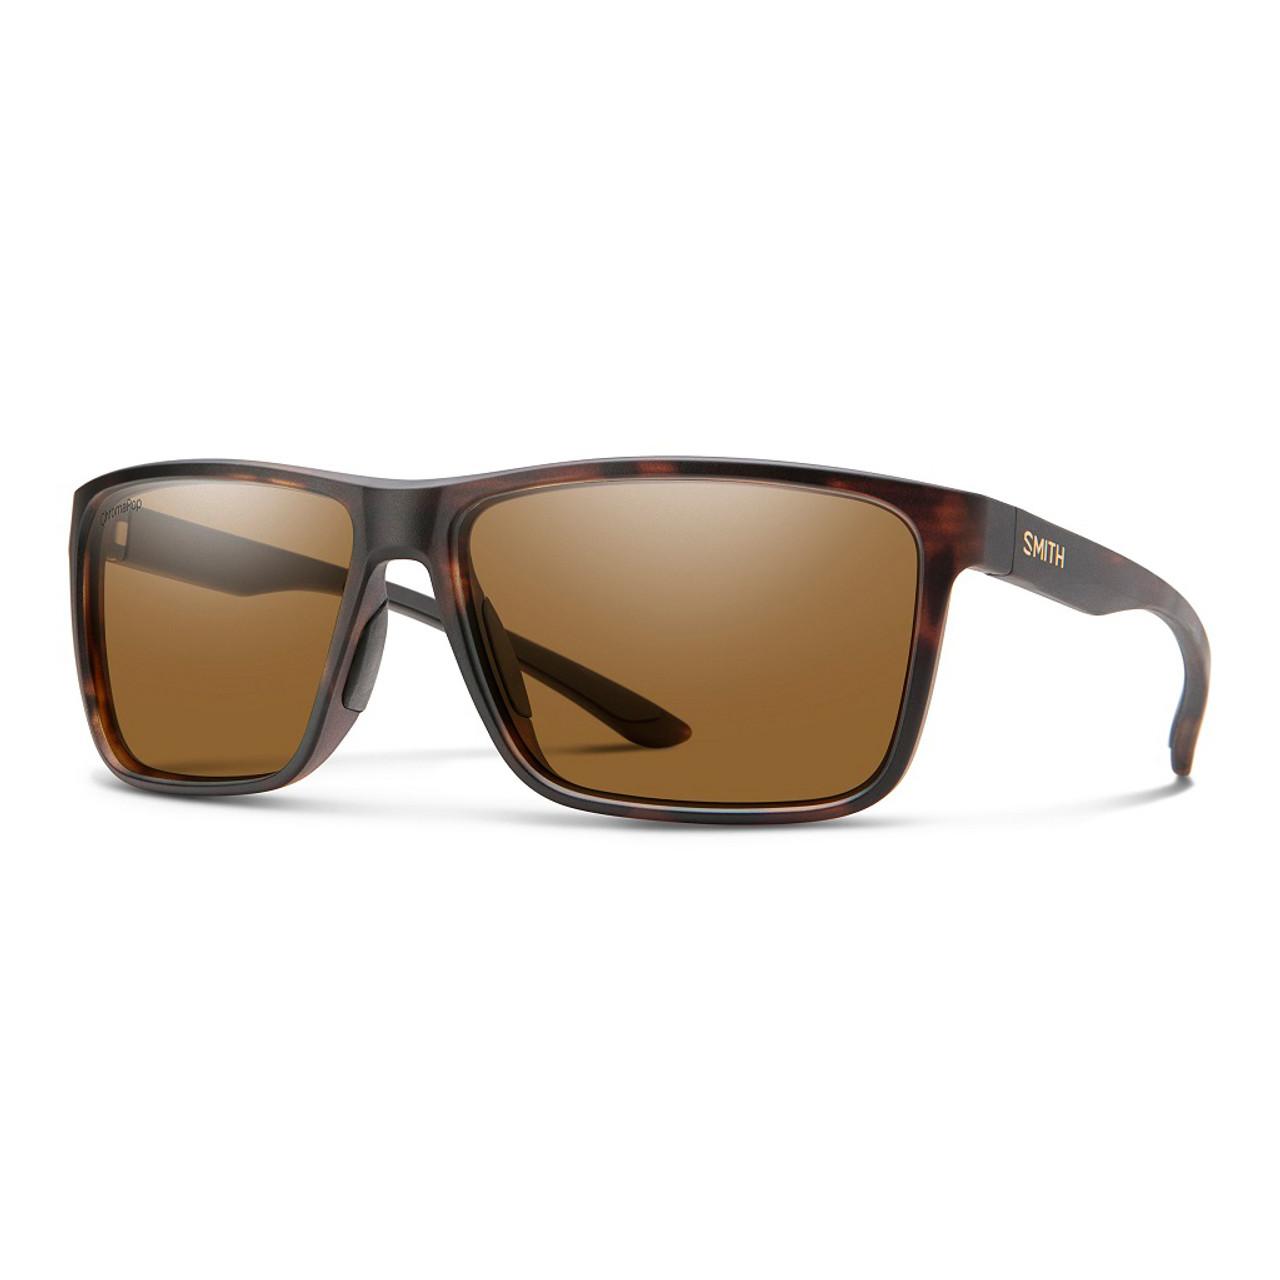 Matte Tortoise w/ ChromaPop Glass Polarized Brown - Smith Riptide Sunglasses